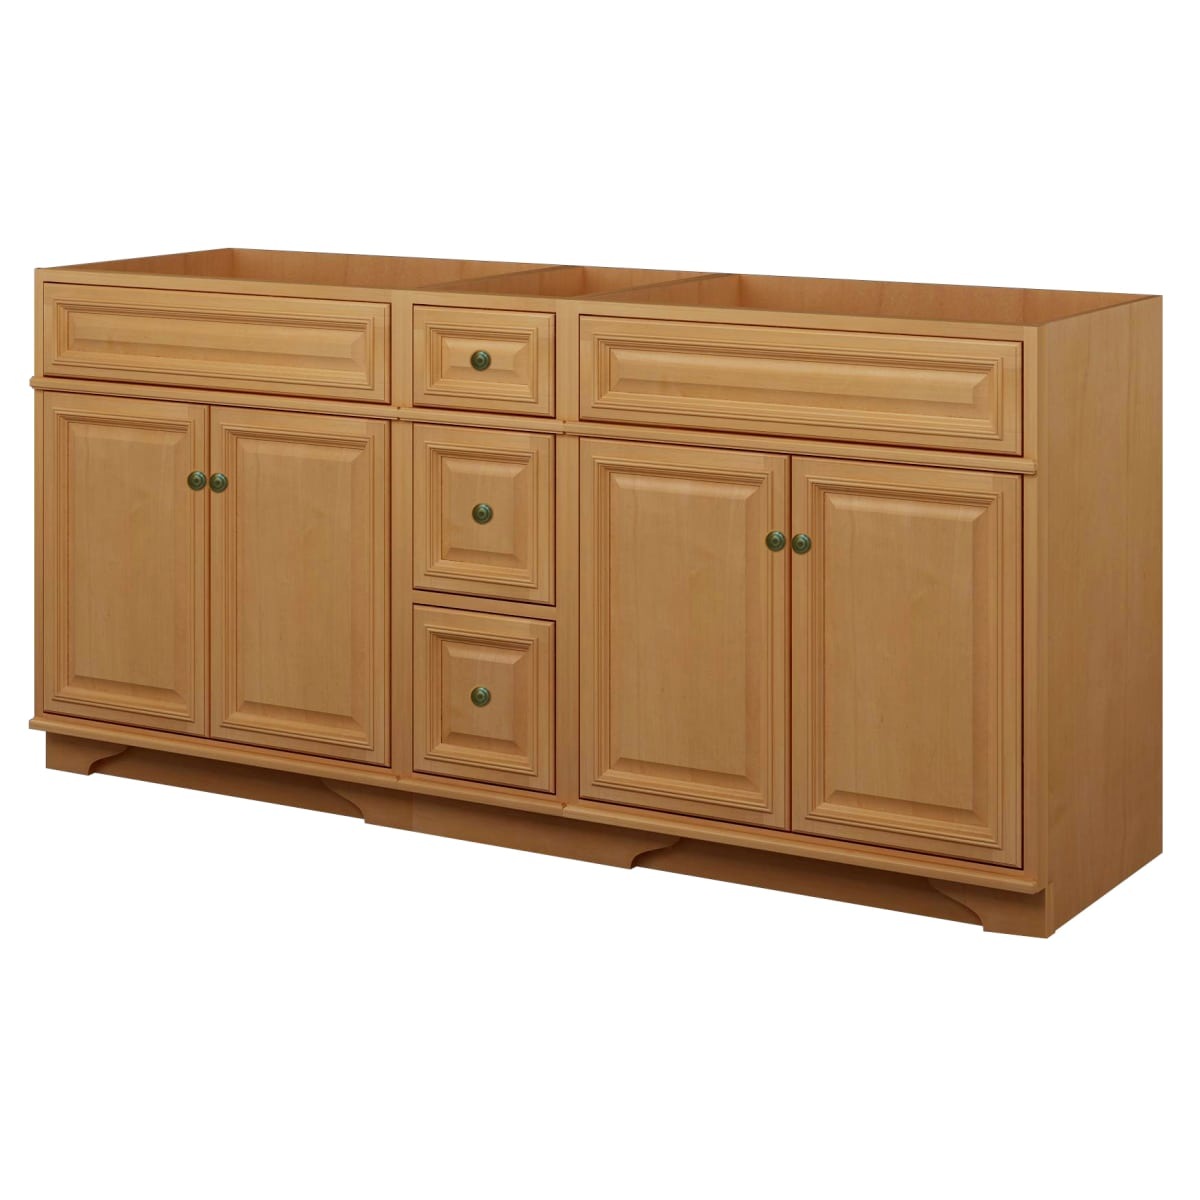 . Sunny Wood BW7221D Briarwood Briarwood 72  Maple Wood Vanity Cabinet